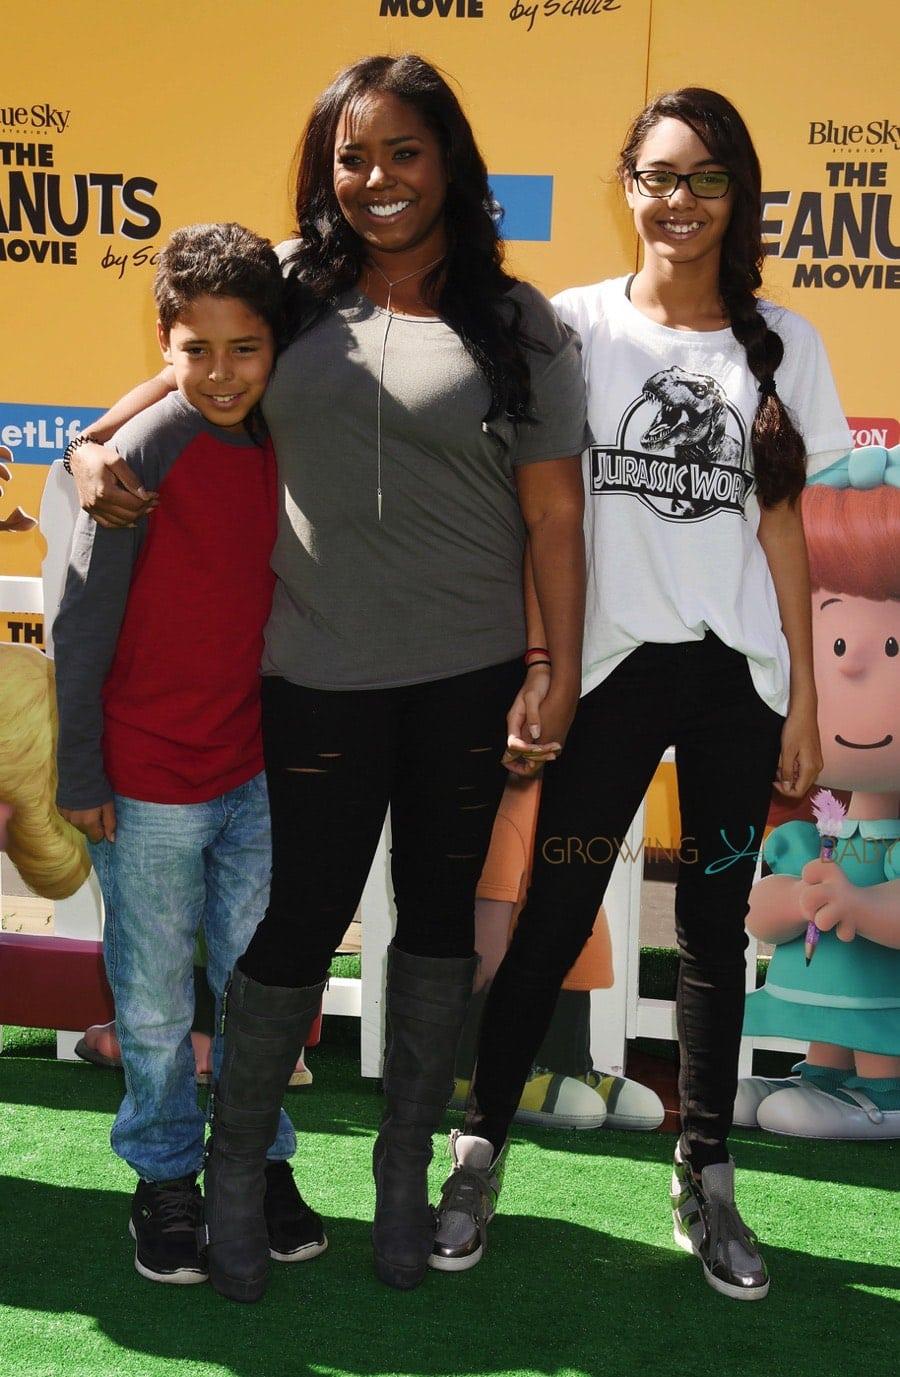 Kevin Federline Children 2015